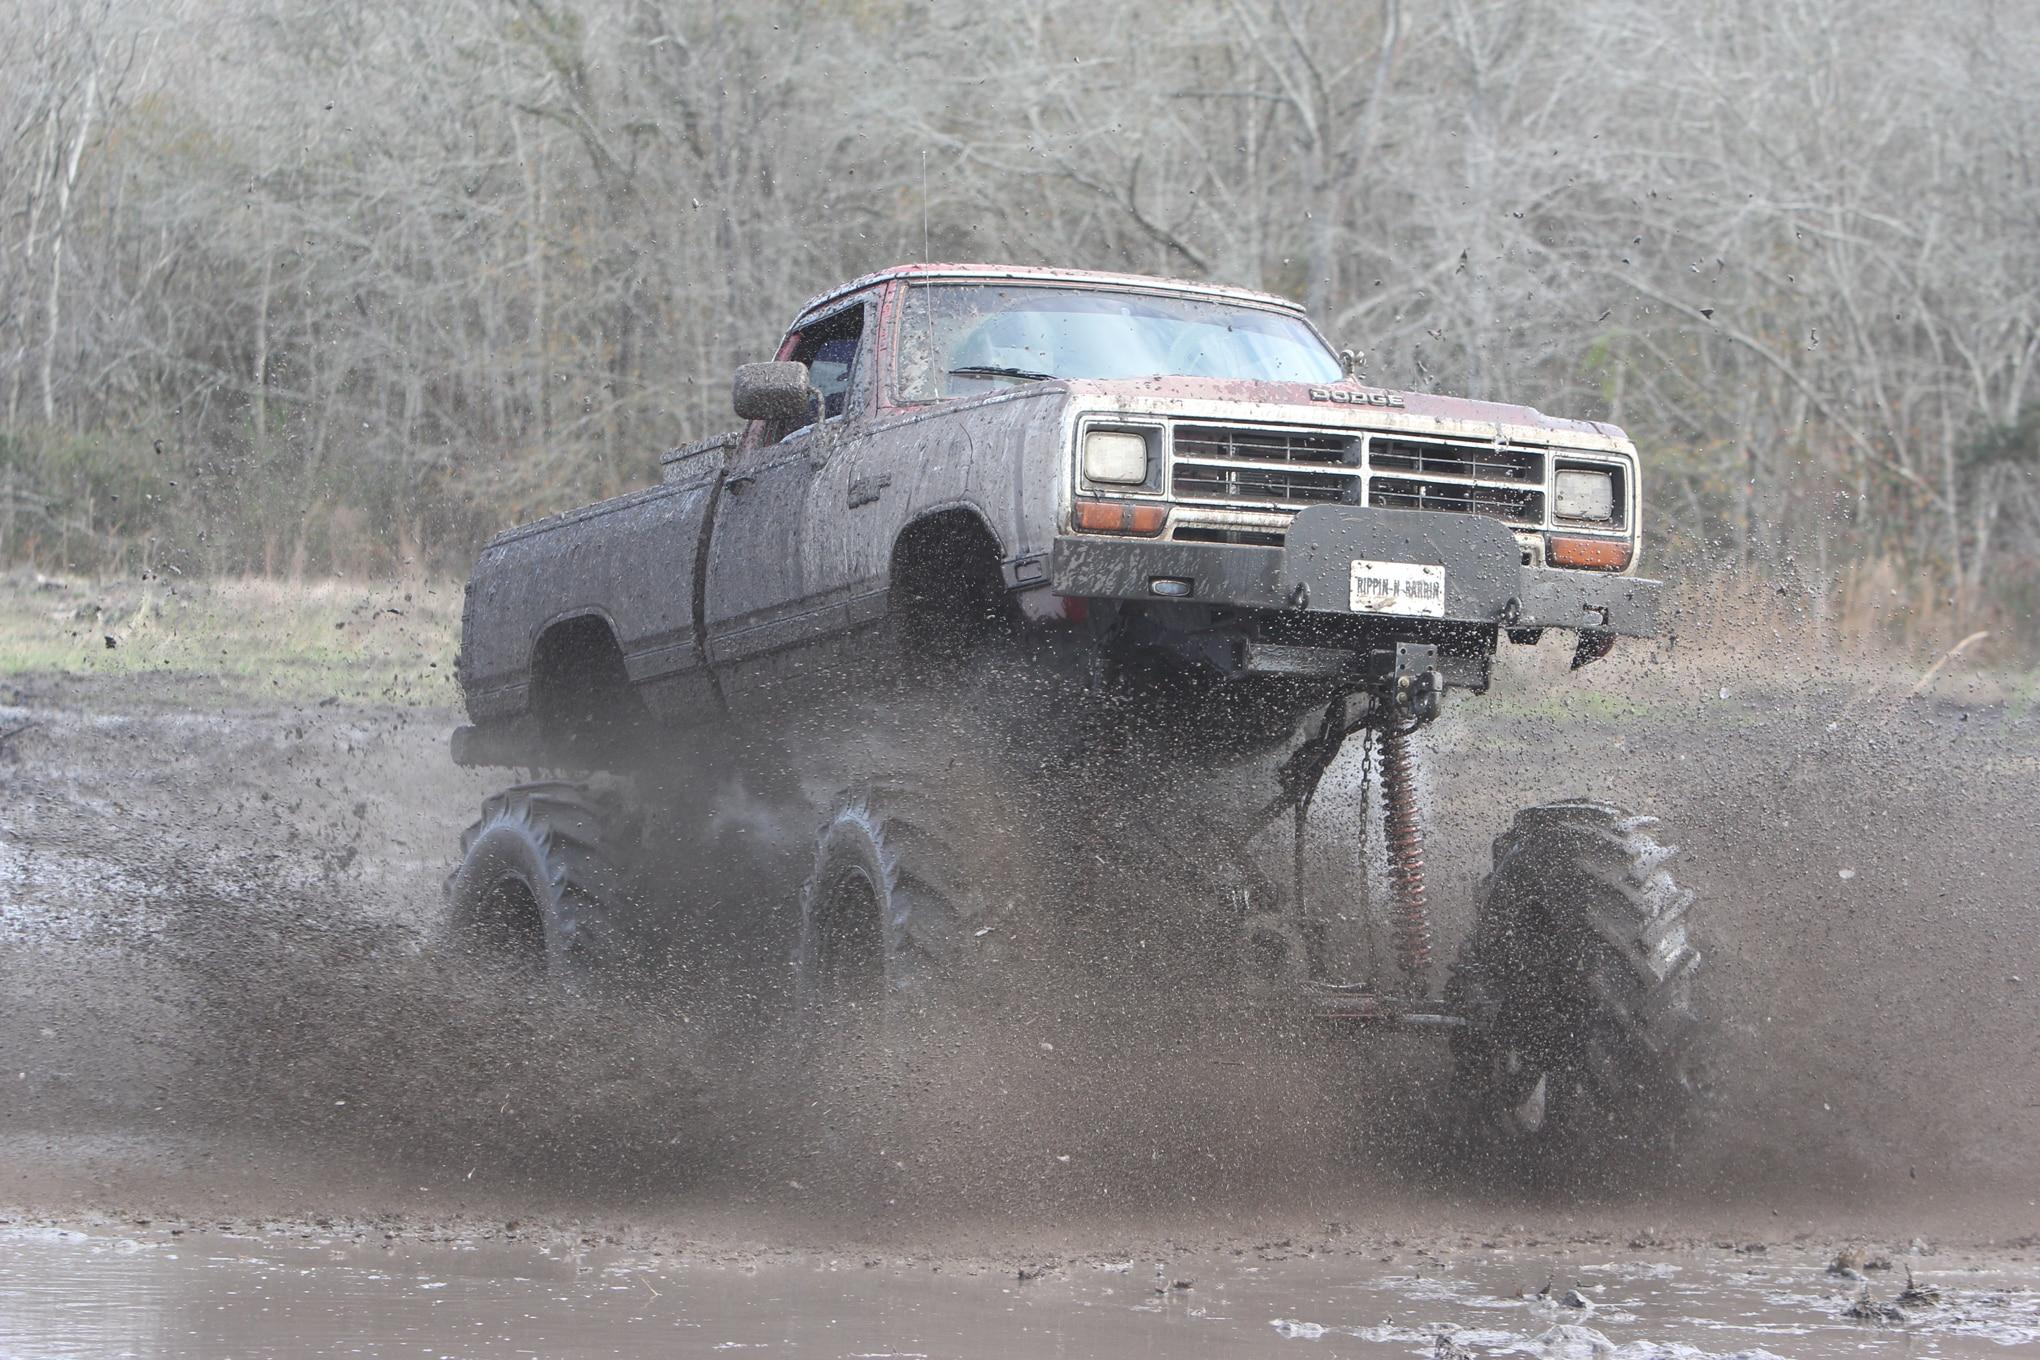 059 south berlin mud ranch 2016